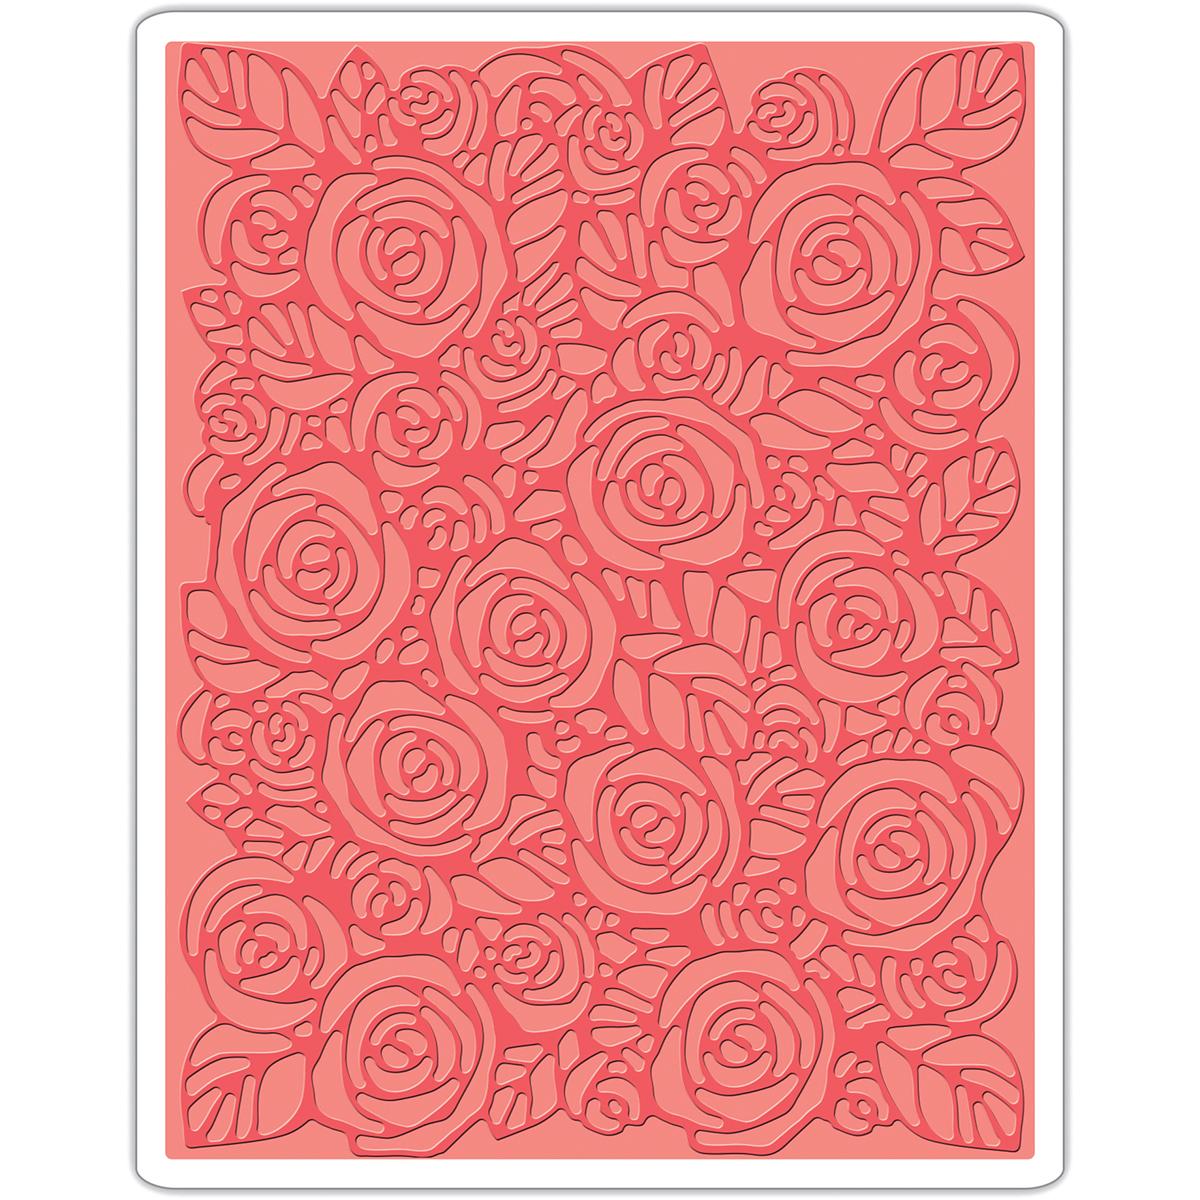 Sizzix Roses Embossing Folder